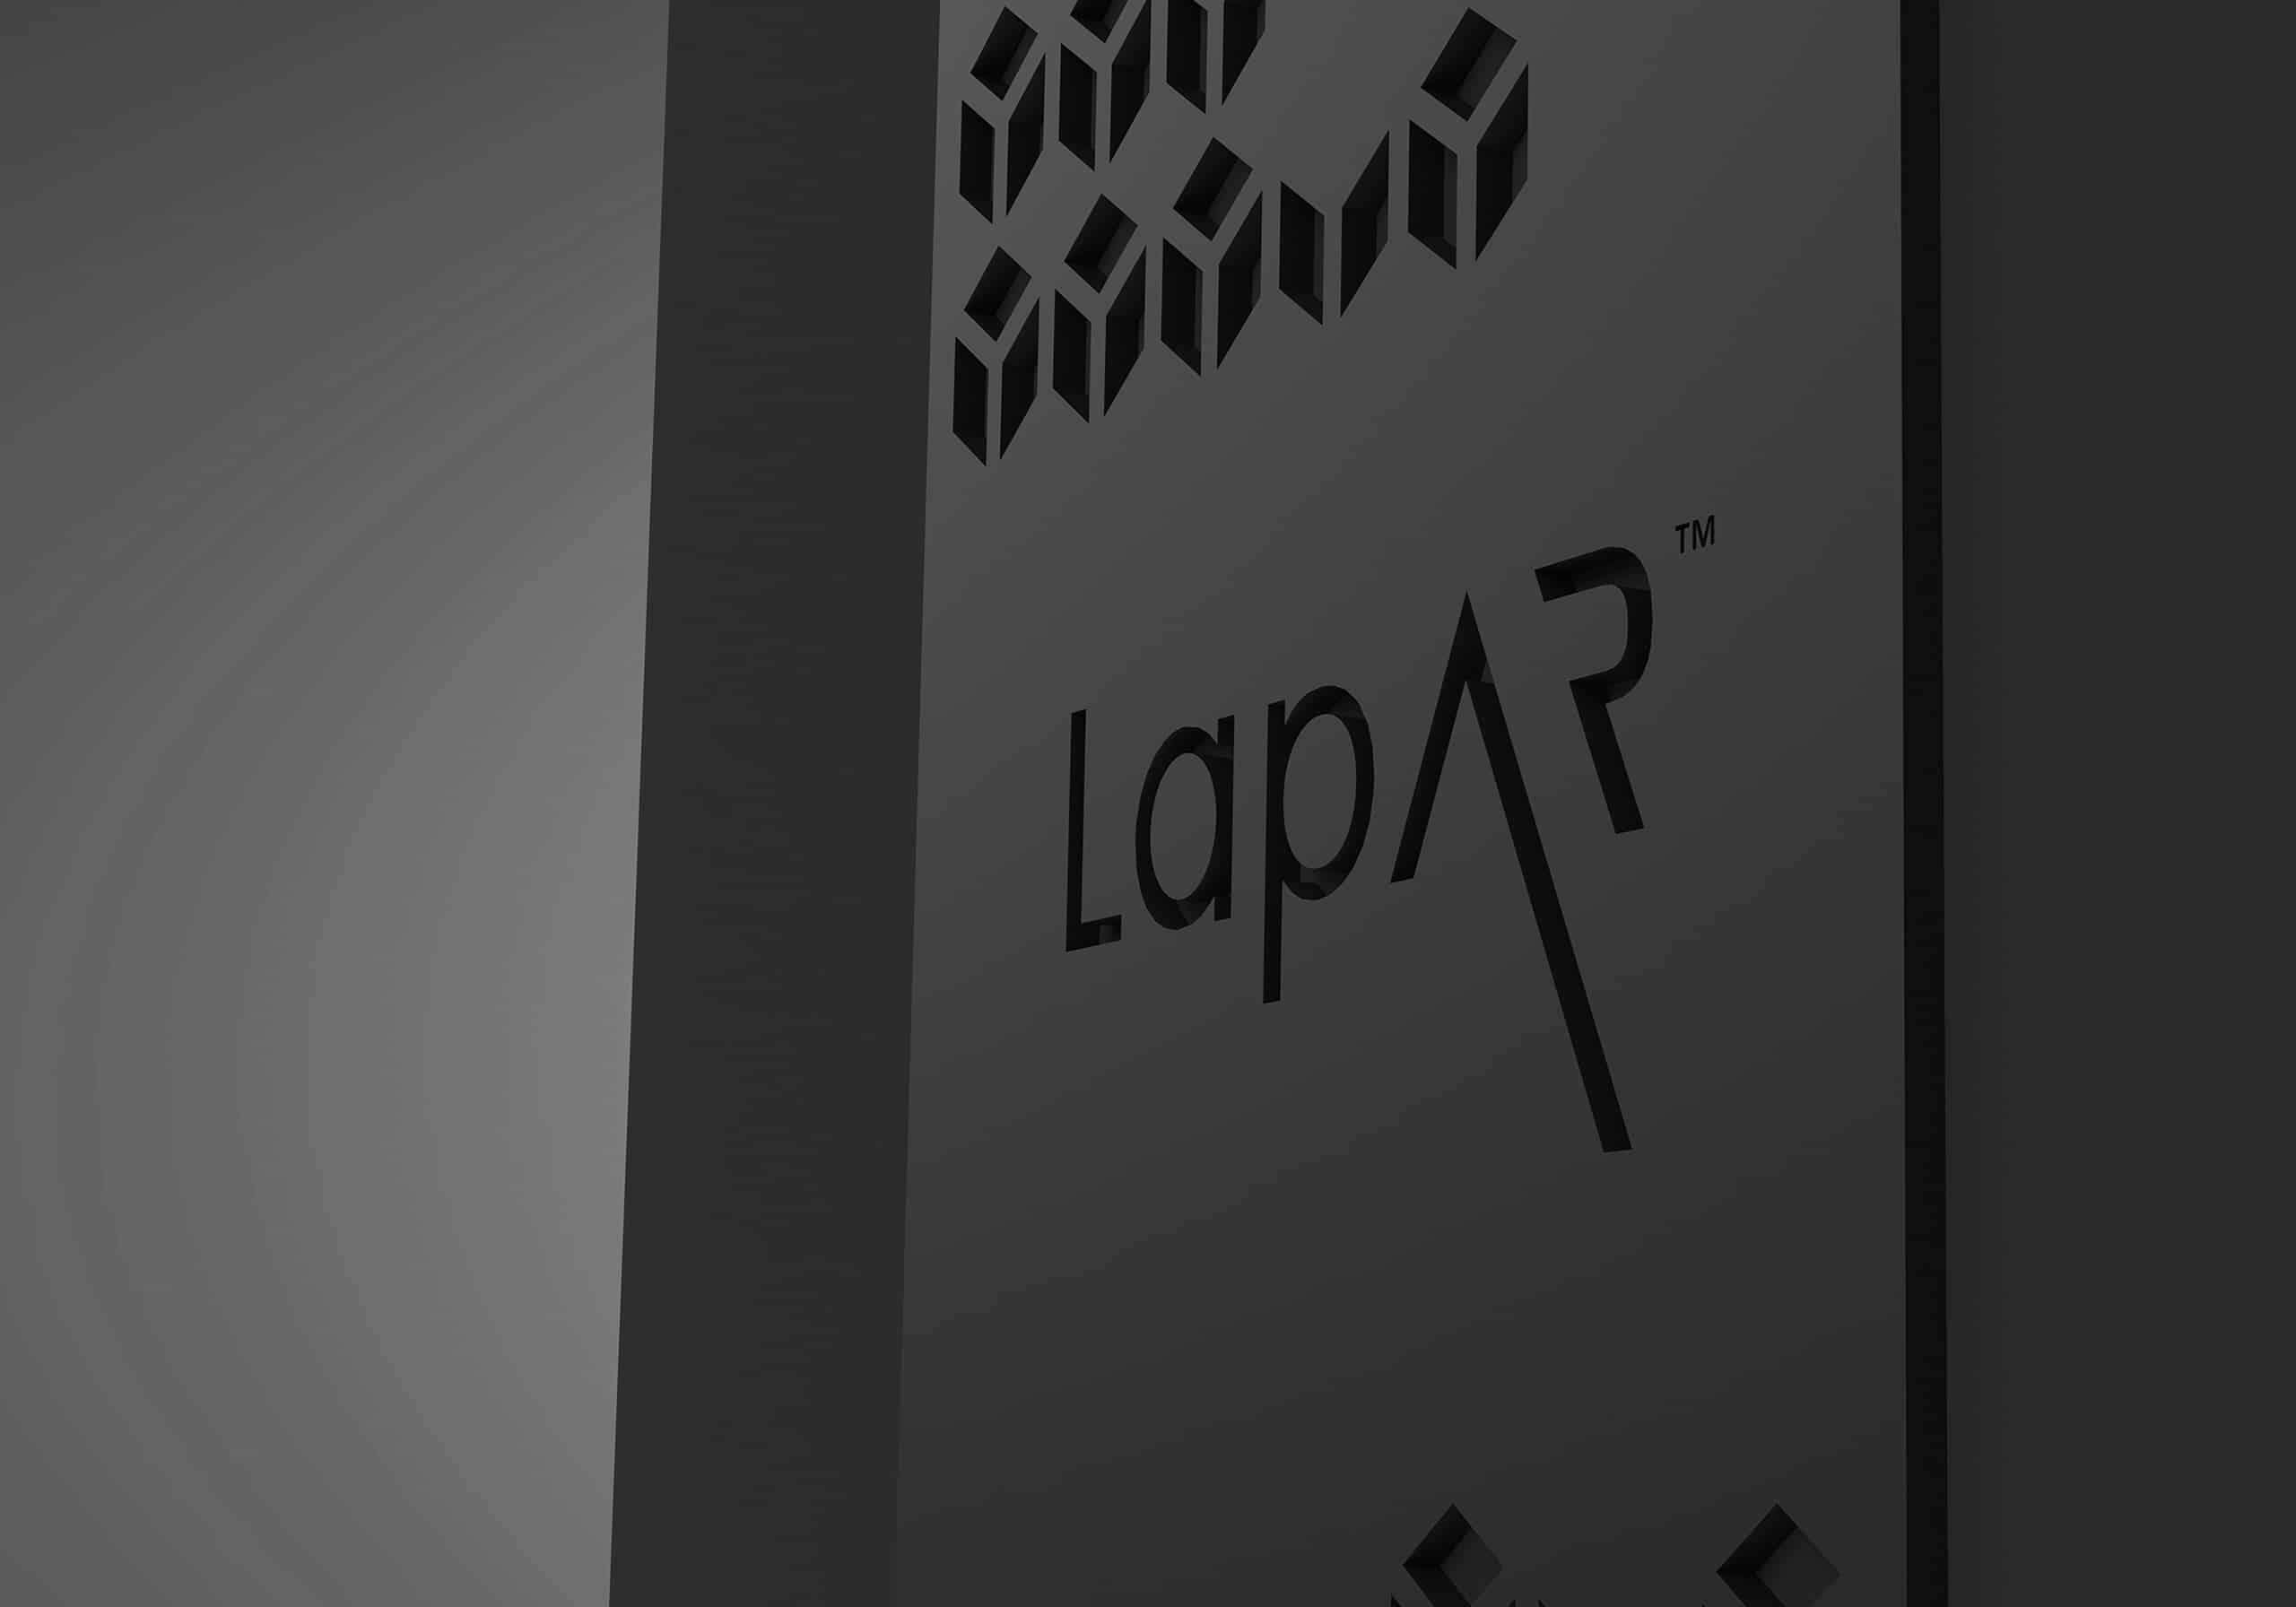 Lap AR File